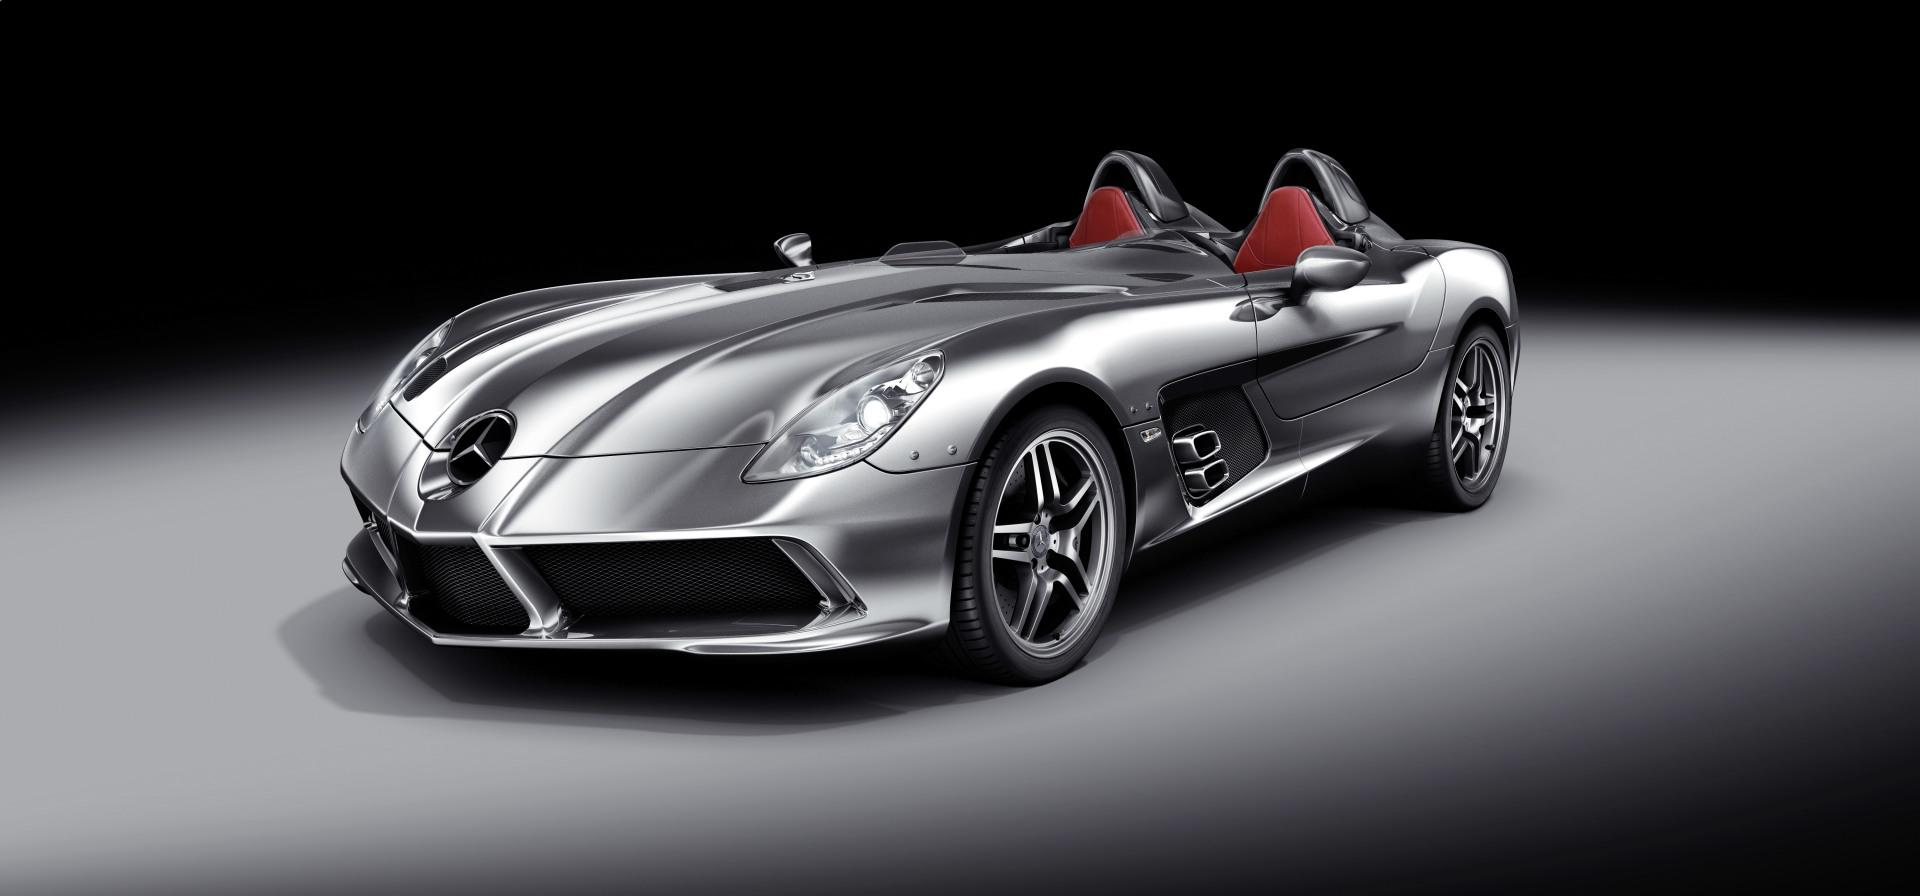 2009 mercedes benz slr stirling moss for Mercedes benz mclaren slr